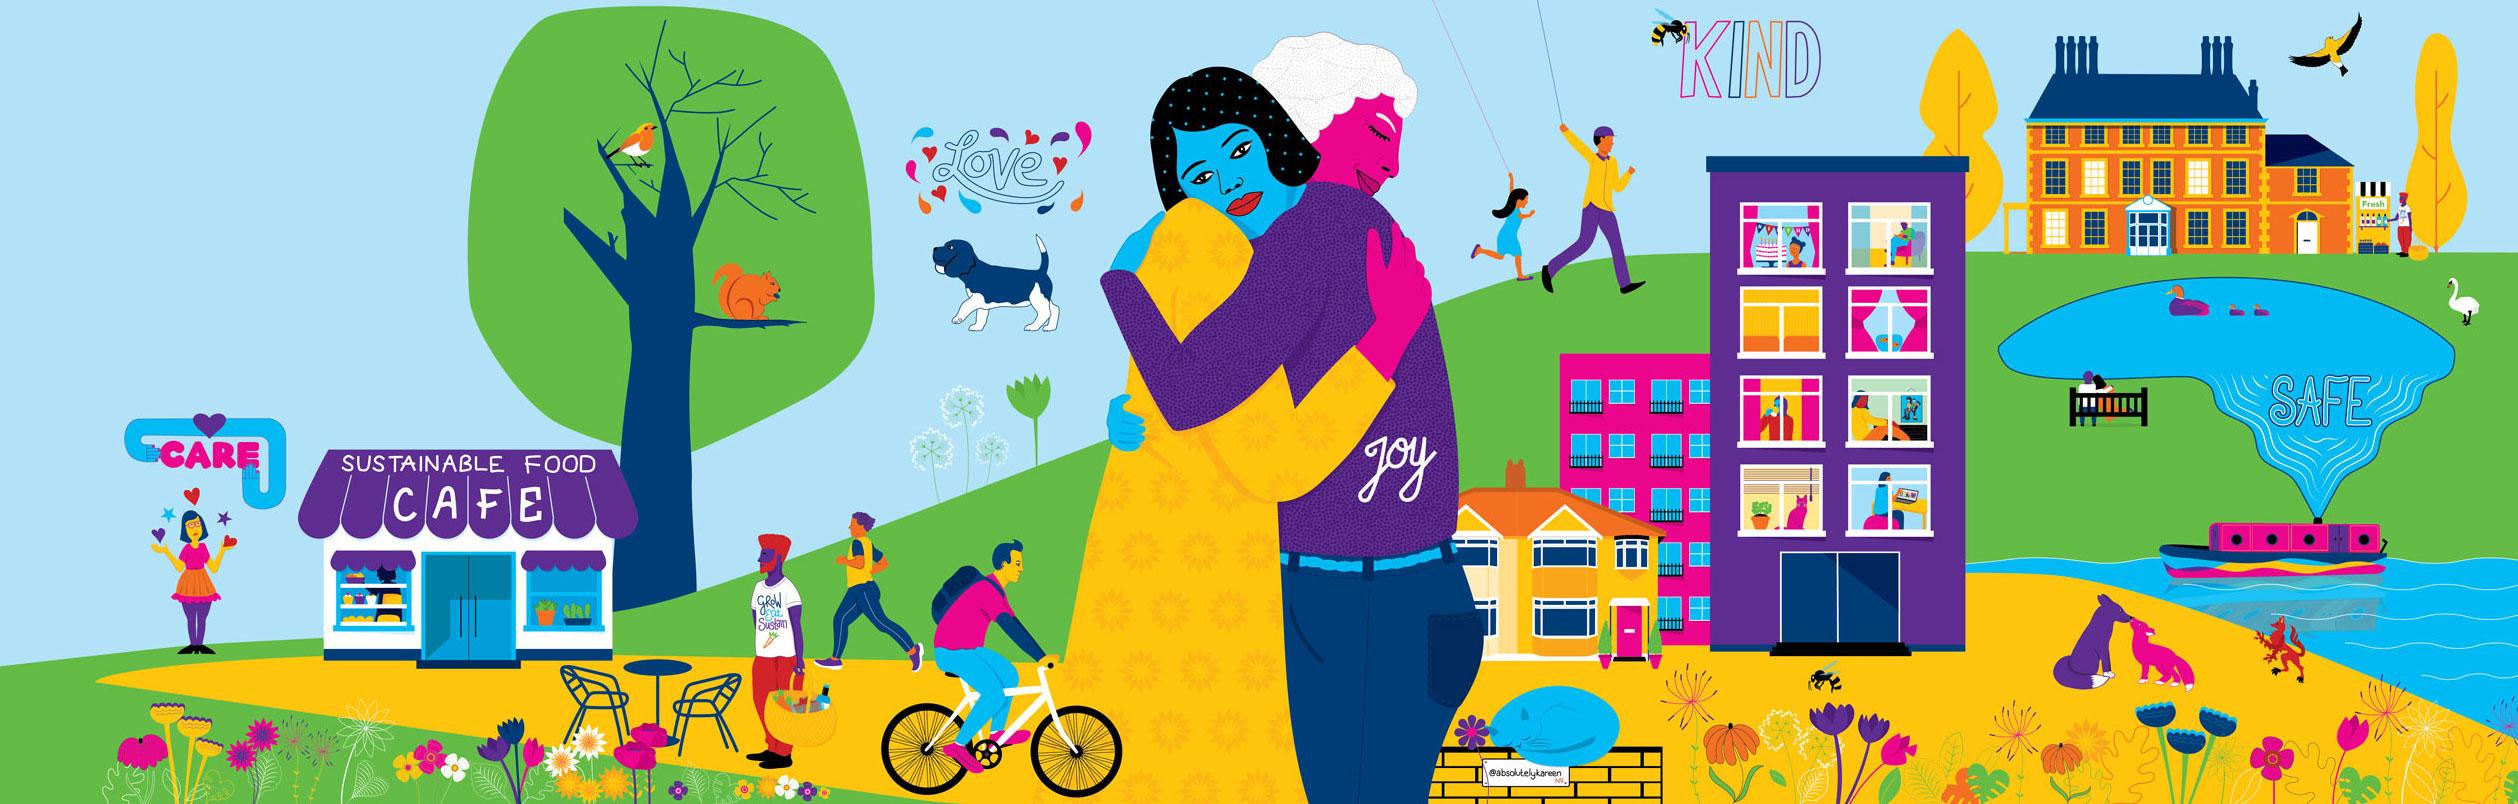 The Hug art showing two people hugging